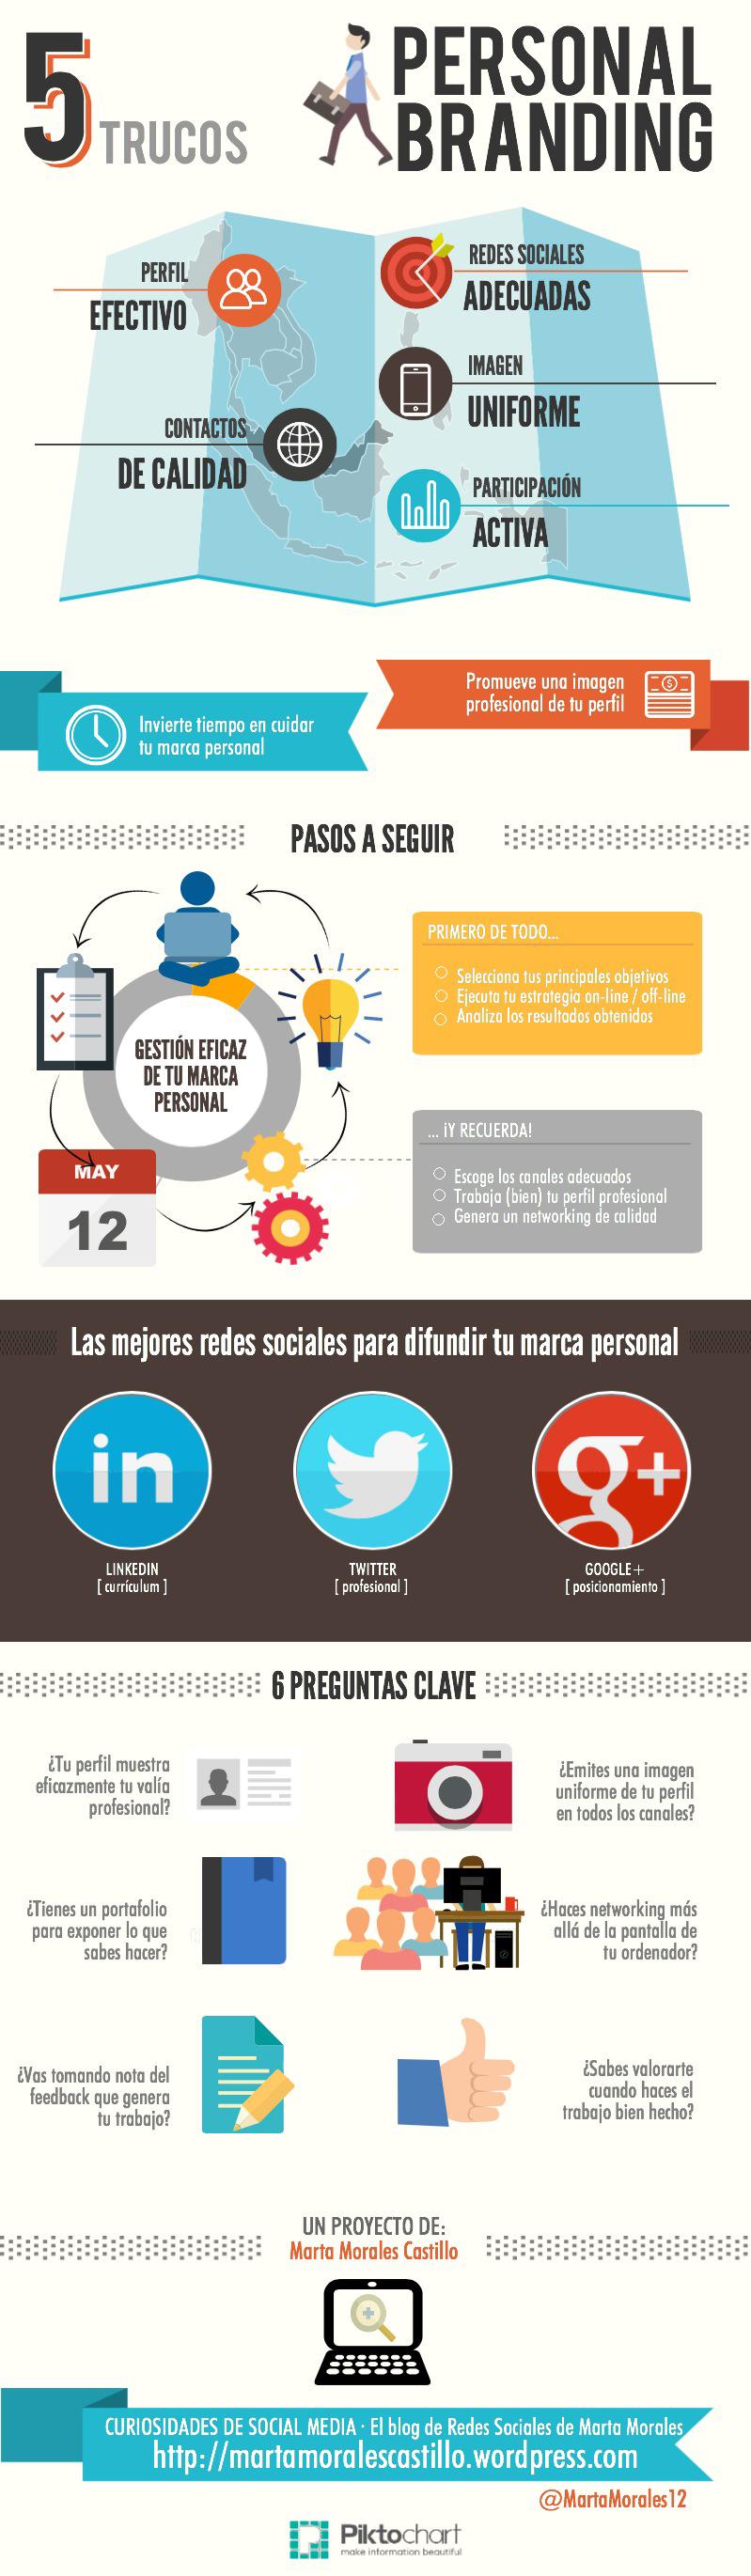 infografia personal branding marca personal redes sociales blog curiosidades social media marta morales periodista community manager